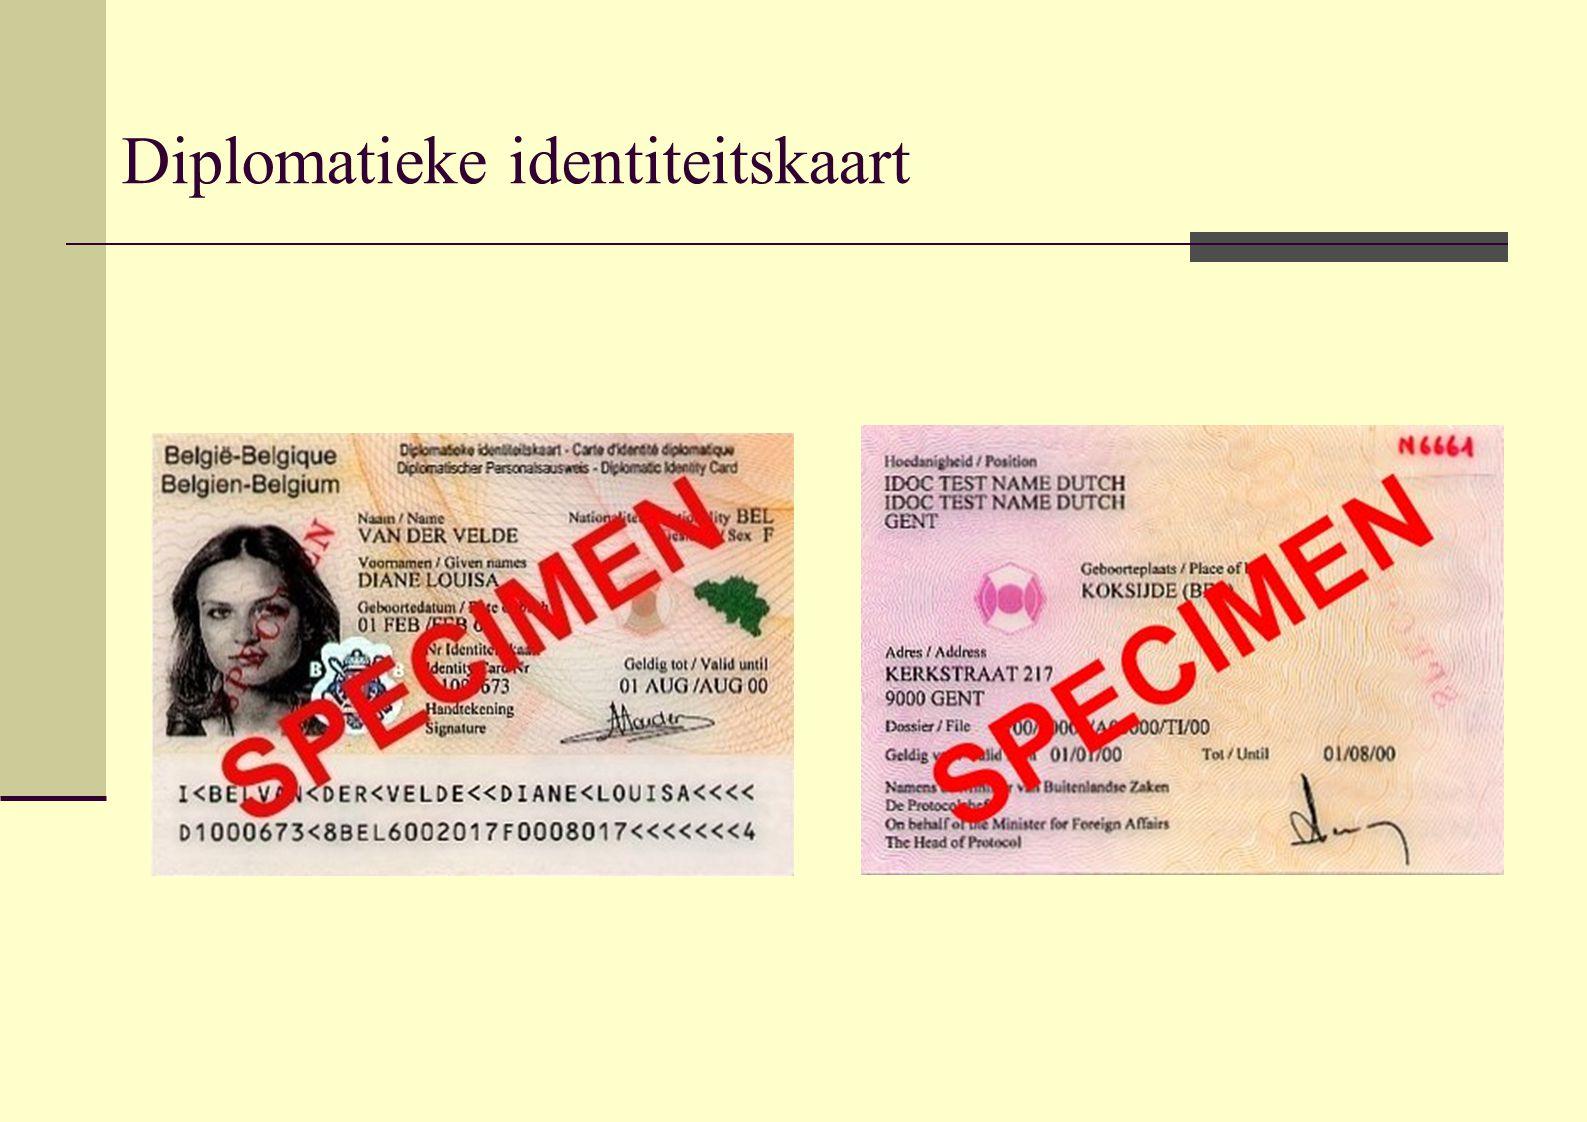 Diplomatieke identiteitskaart